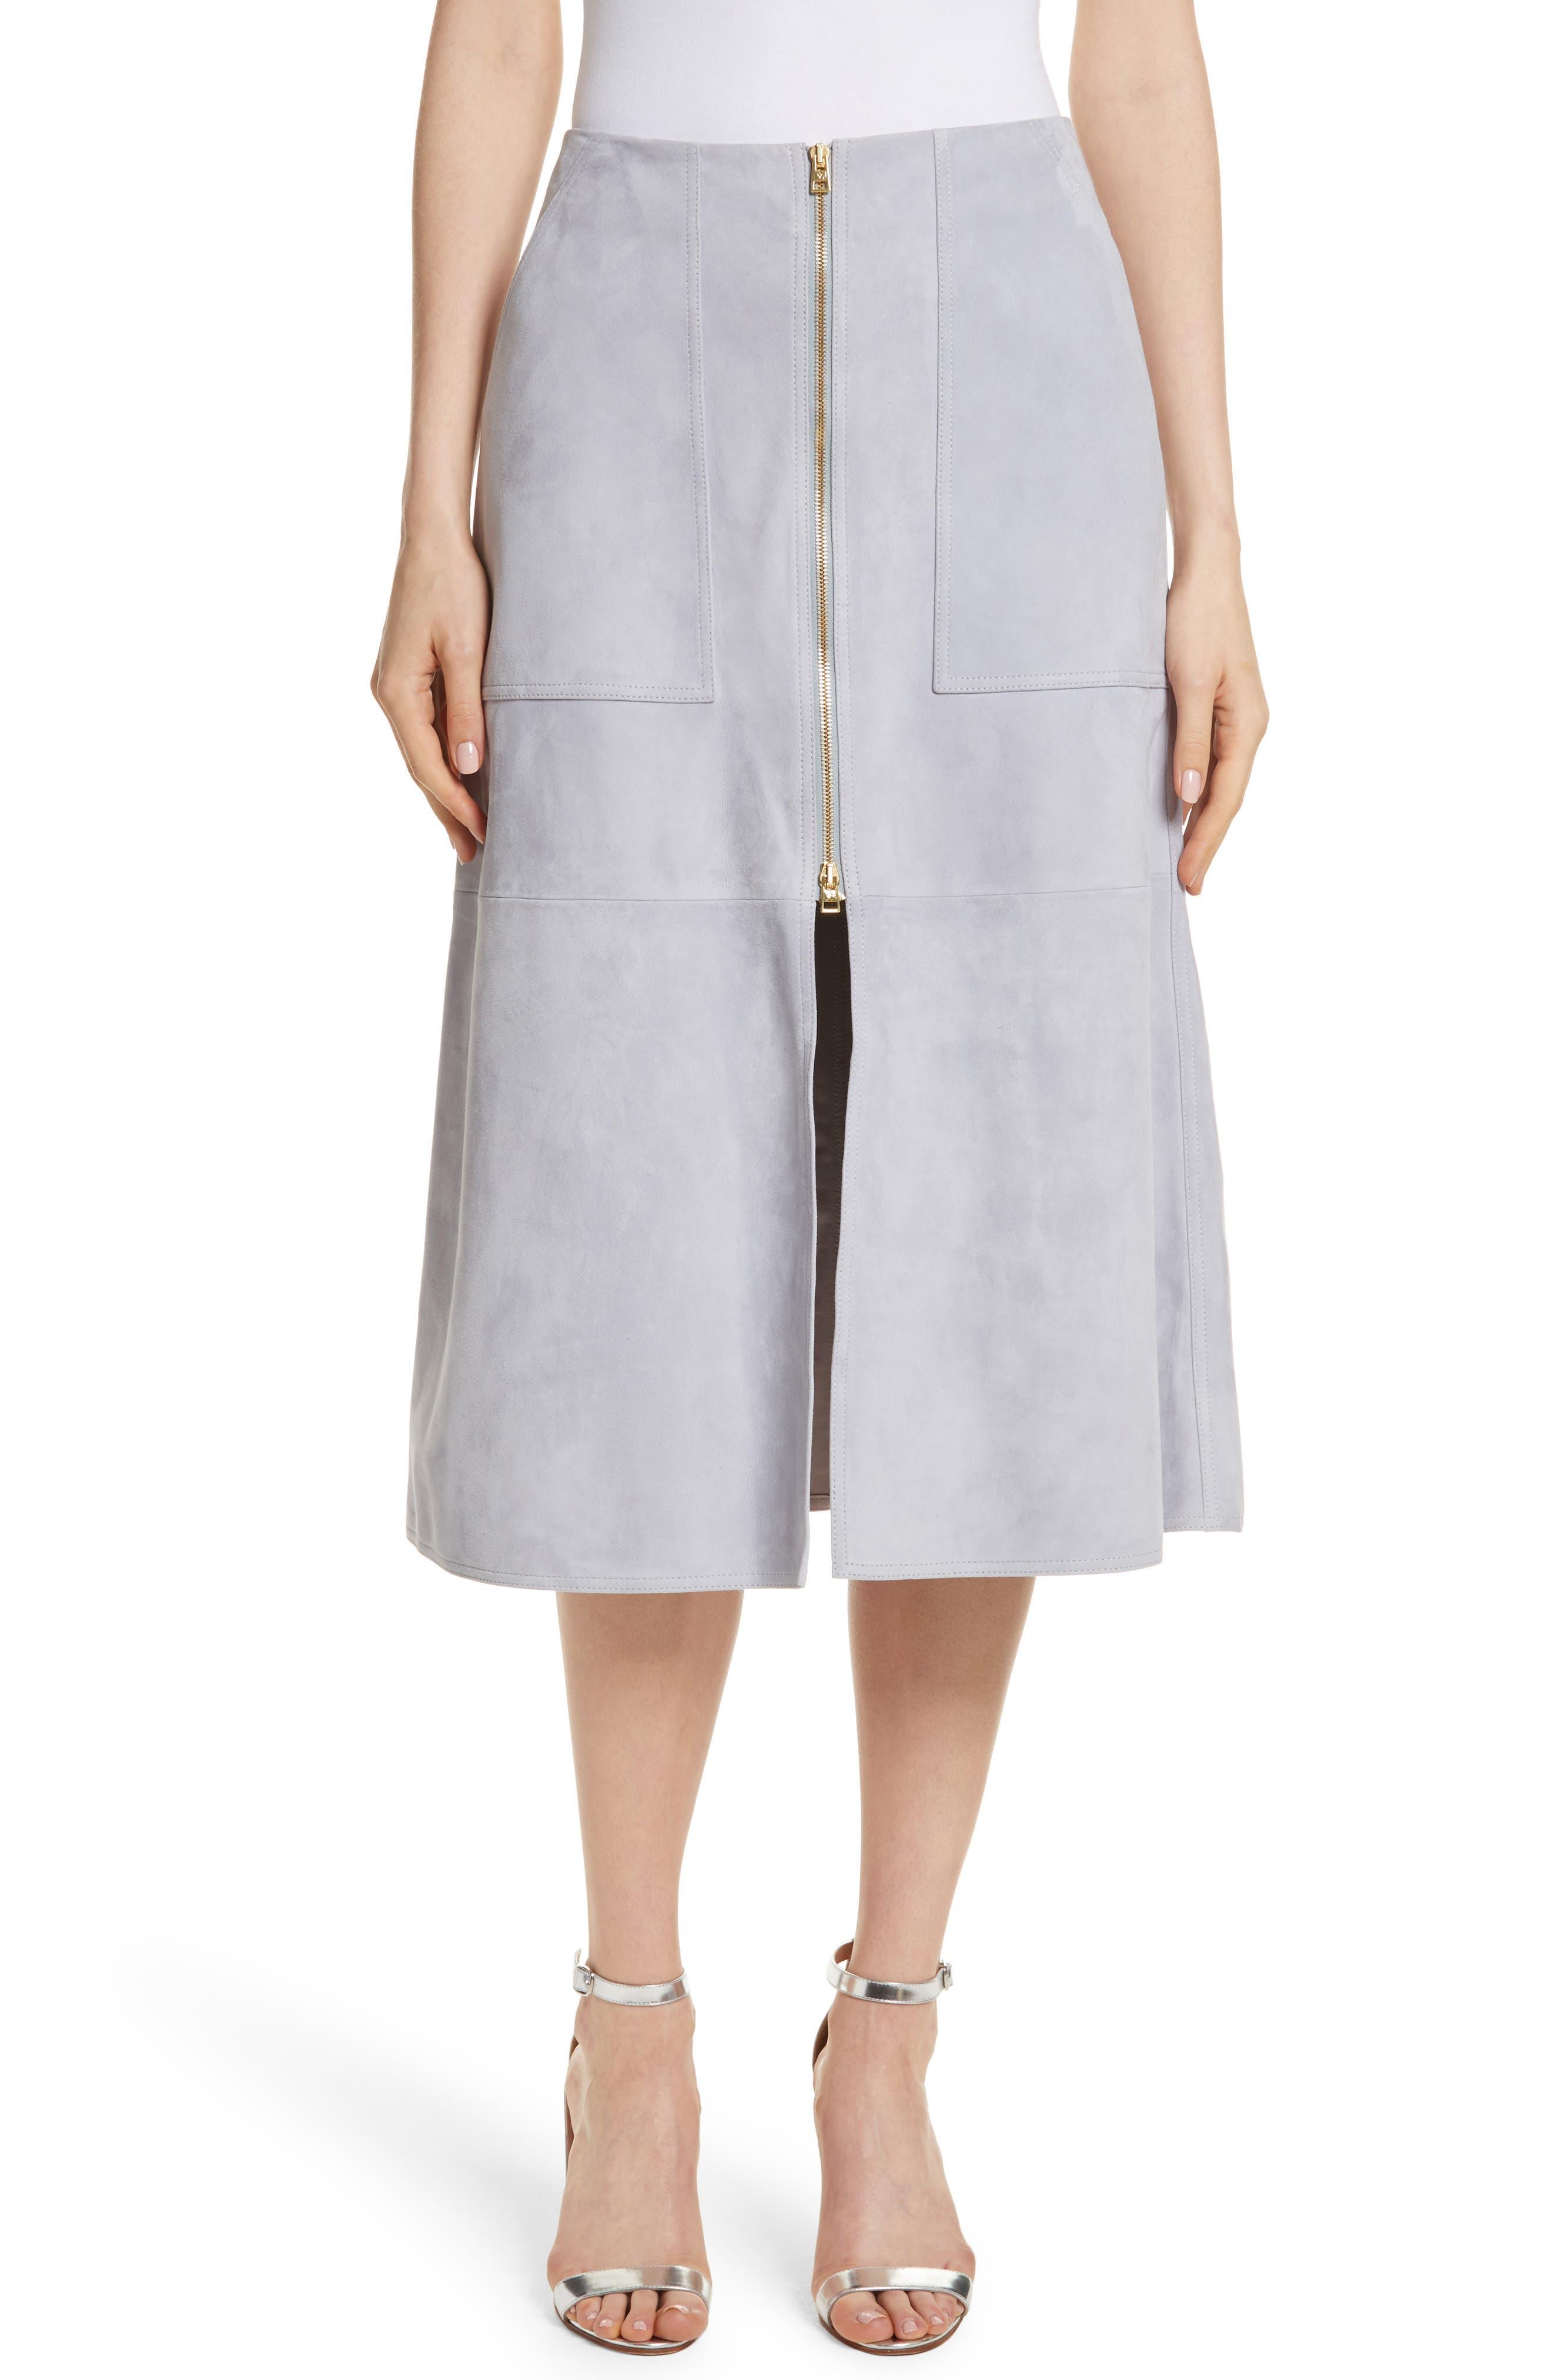 Diane von Furstenberg Patch Pocket Suede Midi Skirt,                             Main thumbnail 1, color,                             031